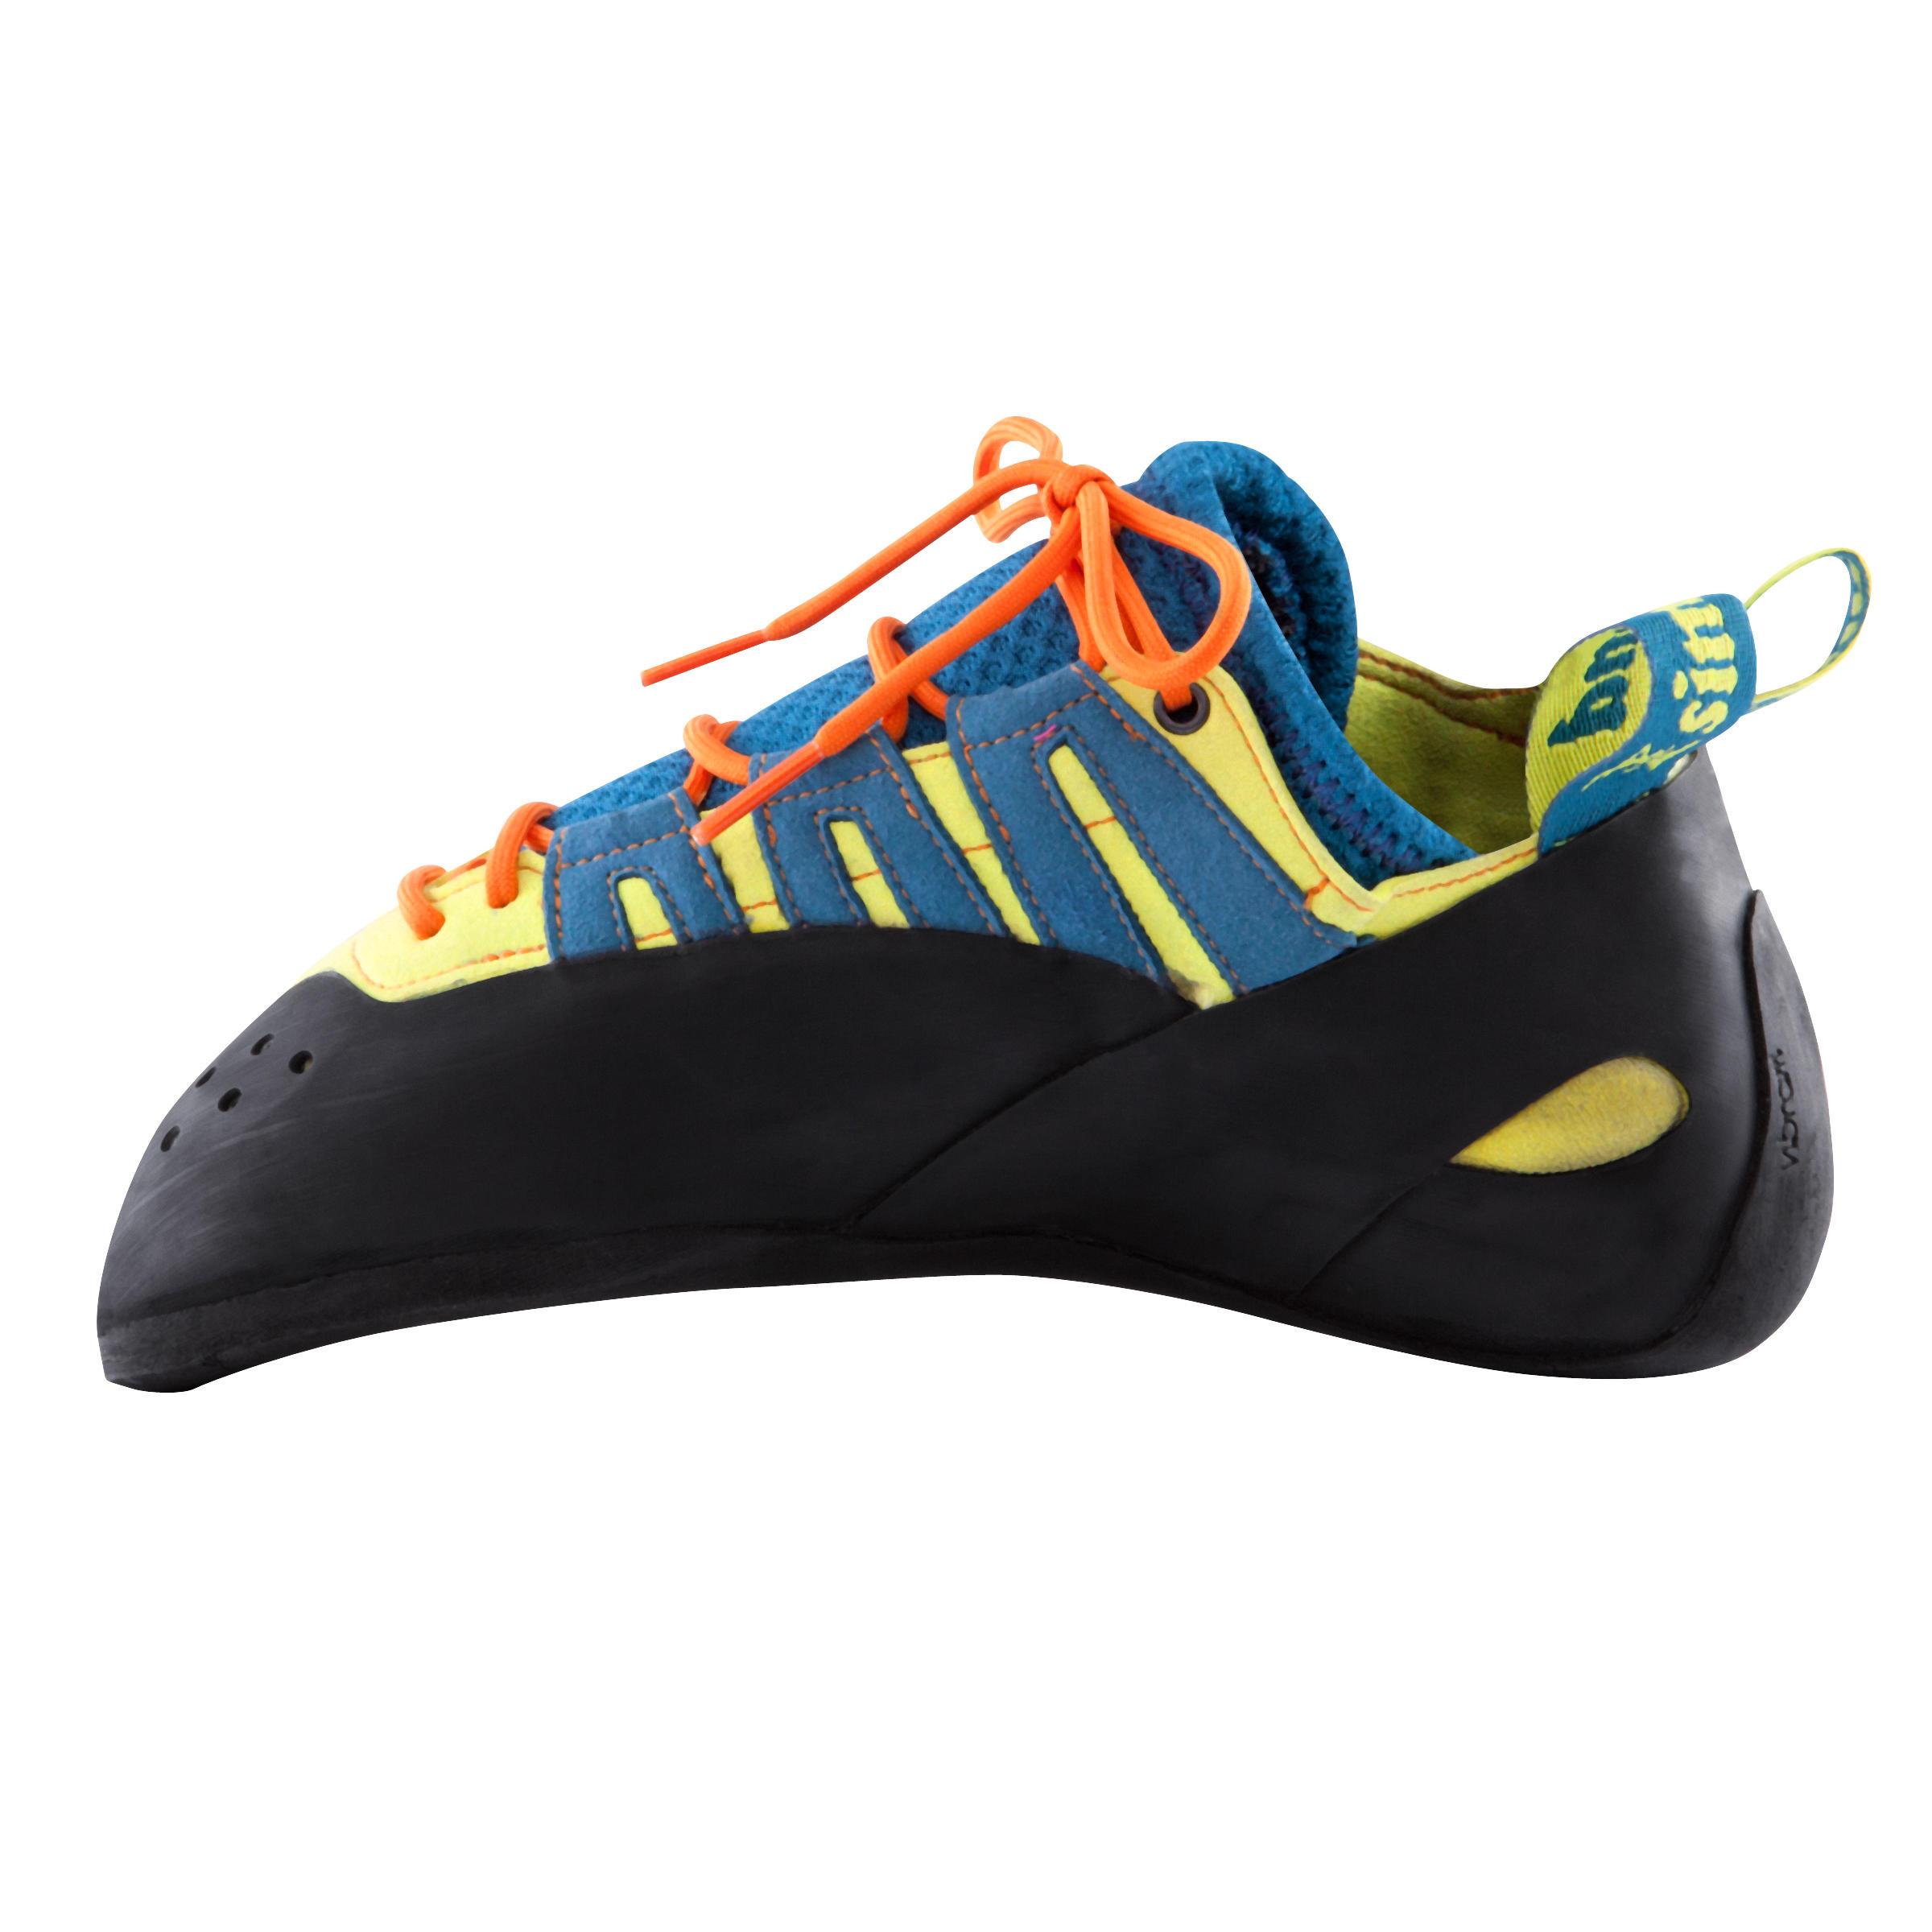 EDGE climbing shoes